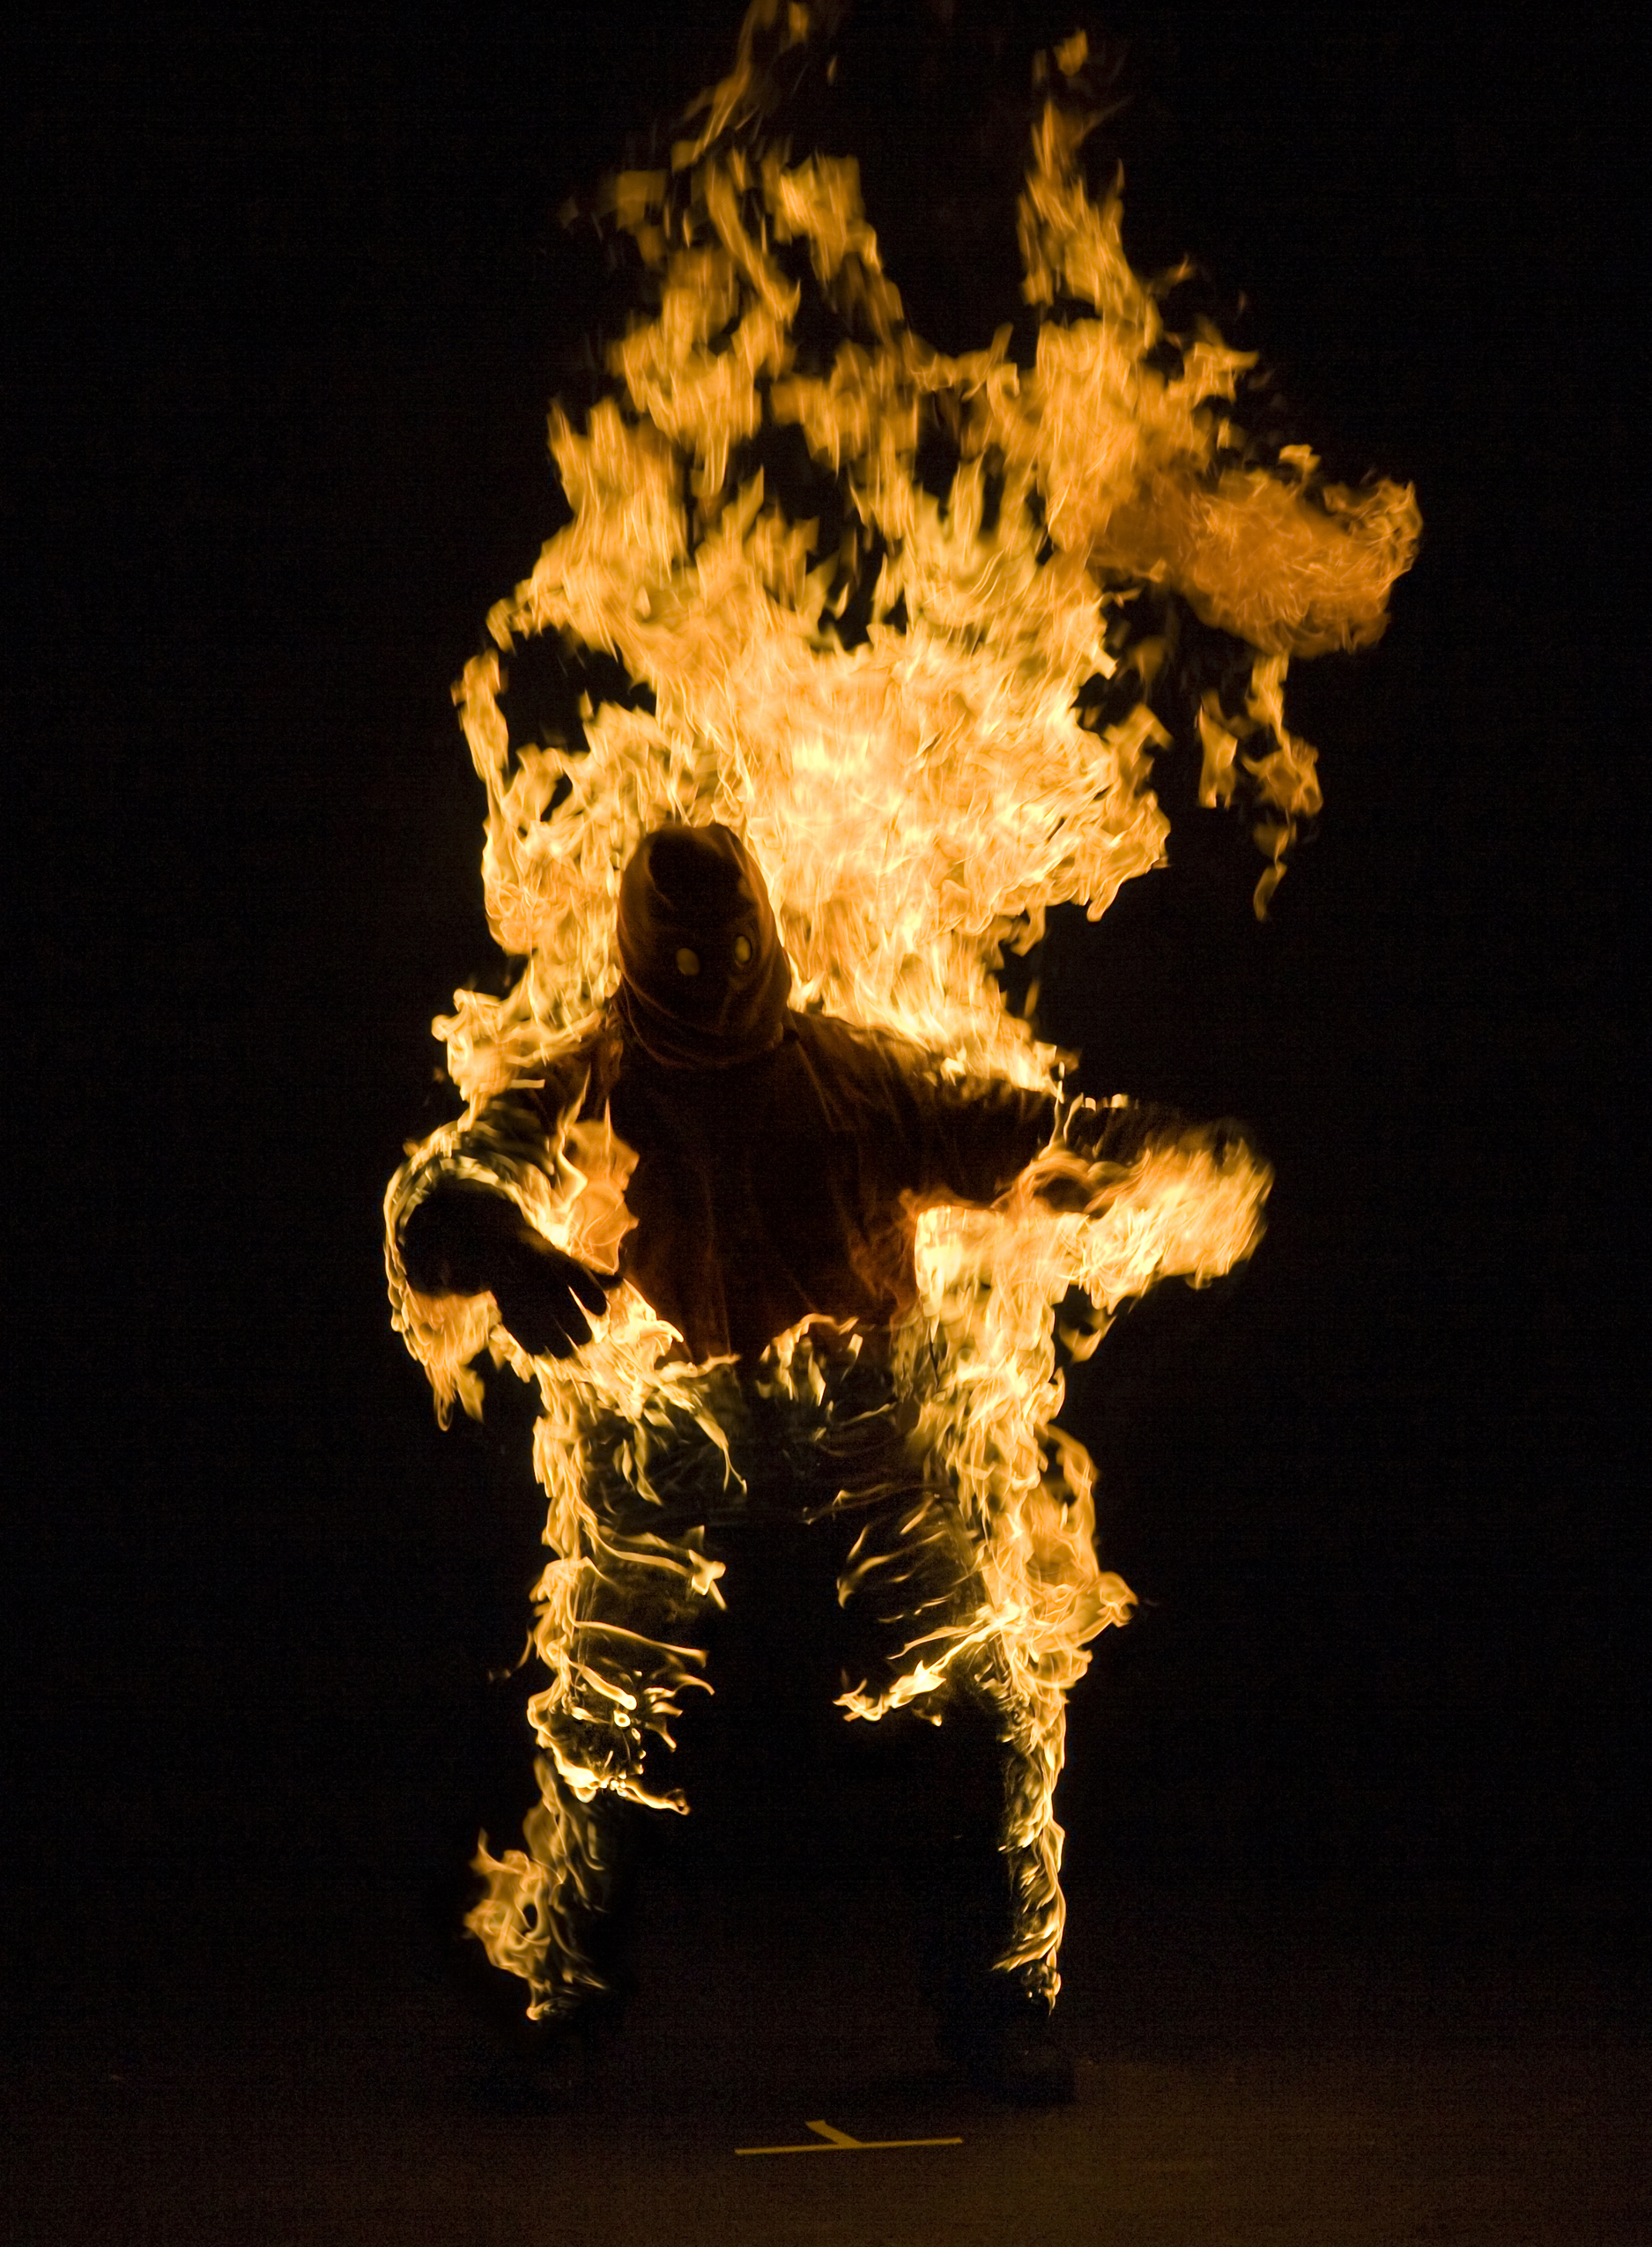 Fire edited-04.jpg